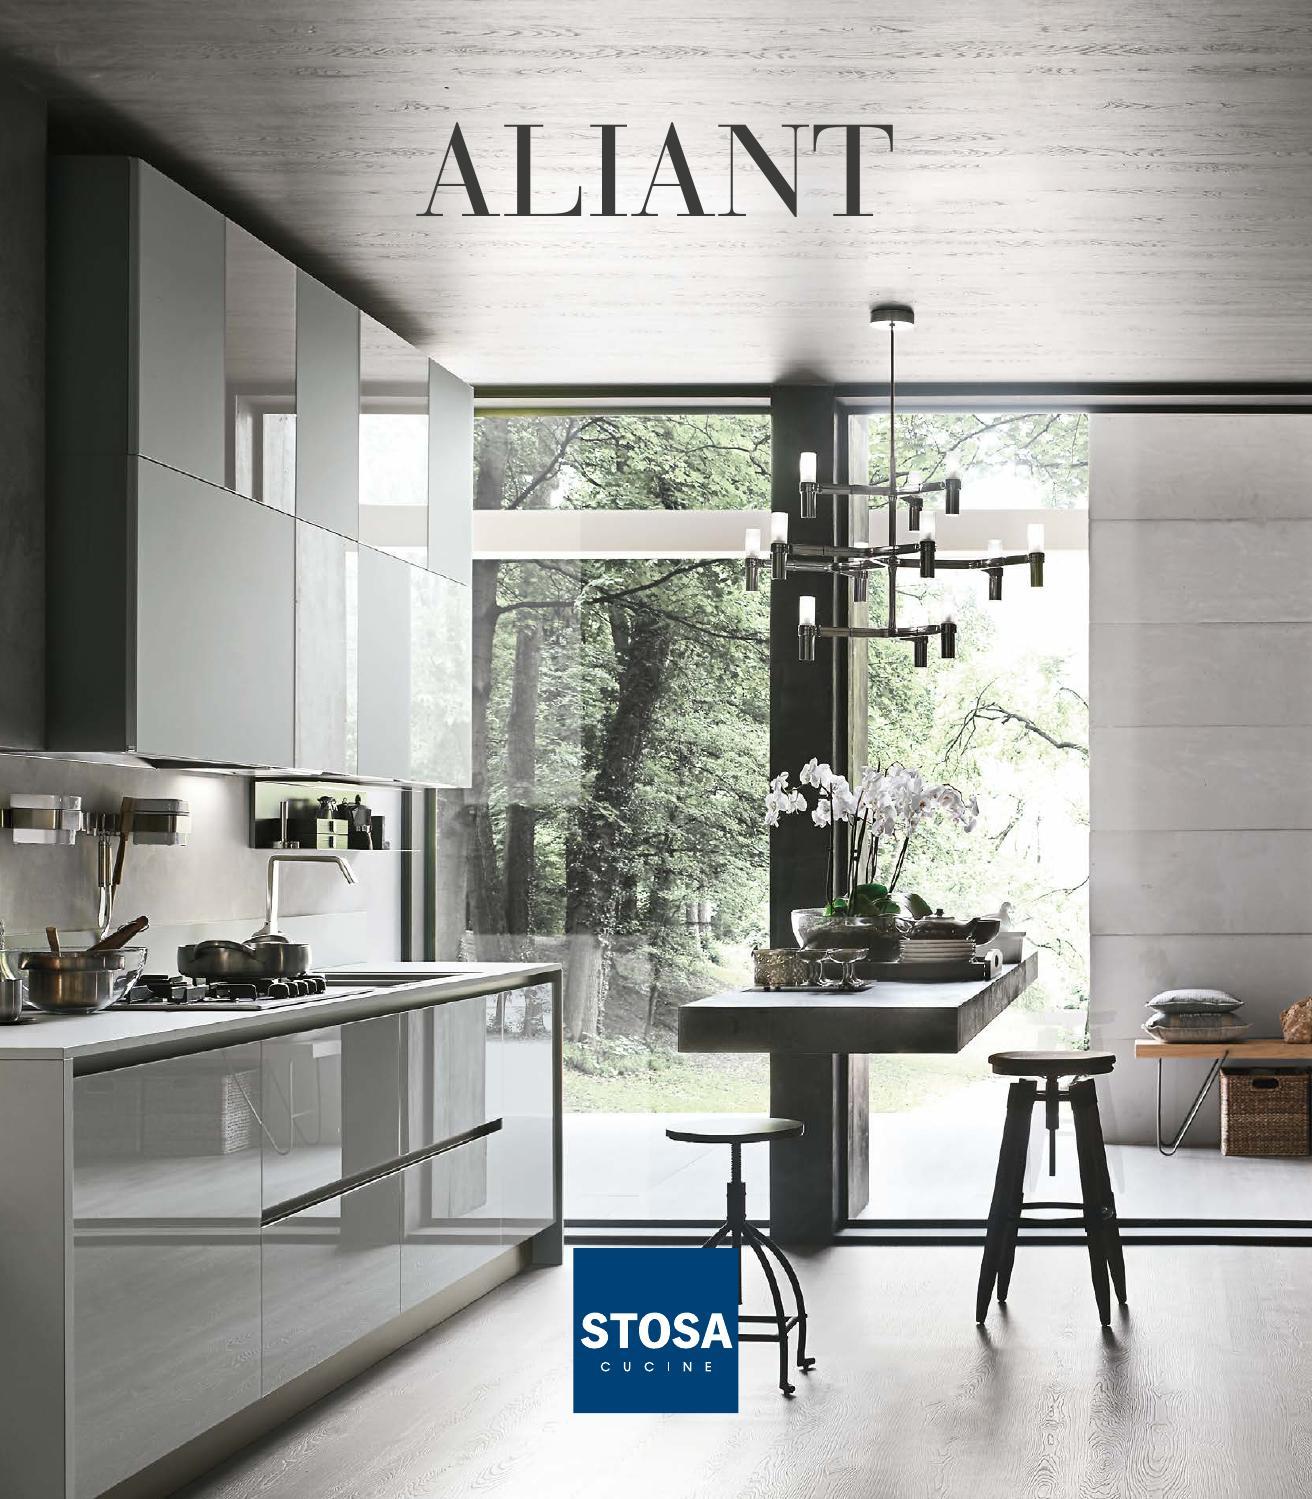 Catalogo cucine moderne stosa aliant by stosa cucine issuu - Stosa cucine catalogo ...